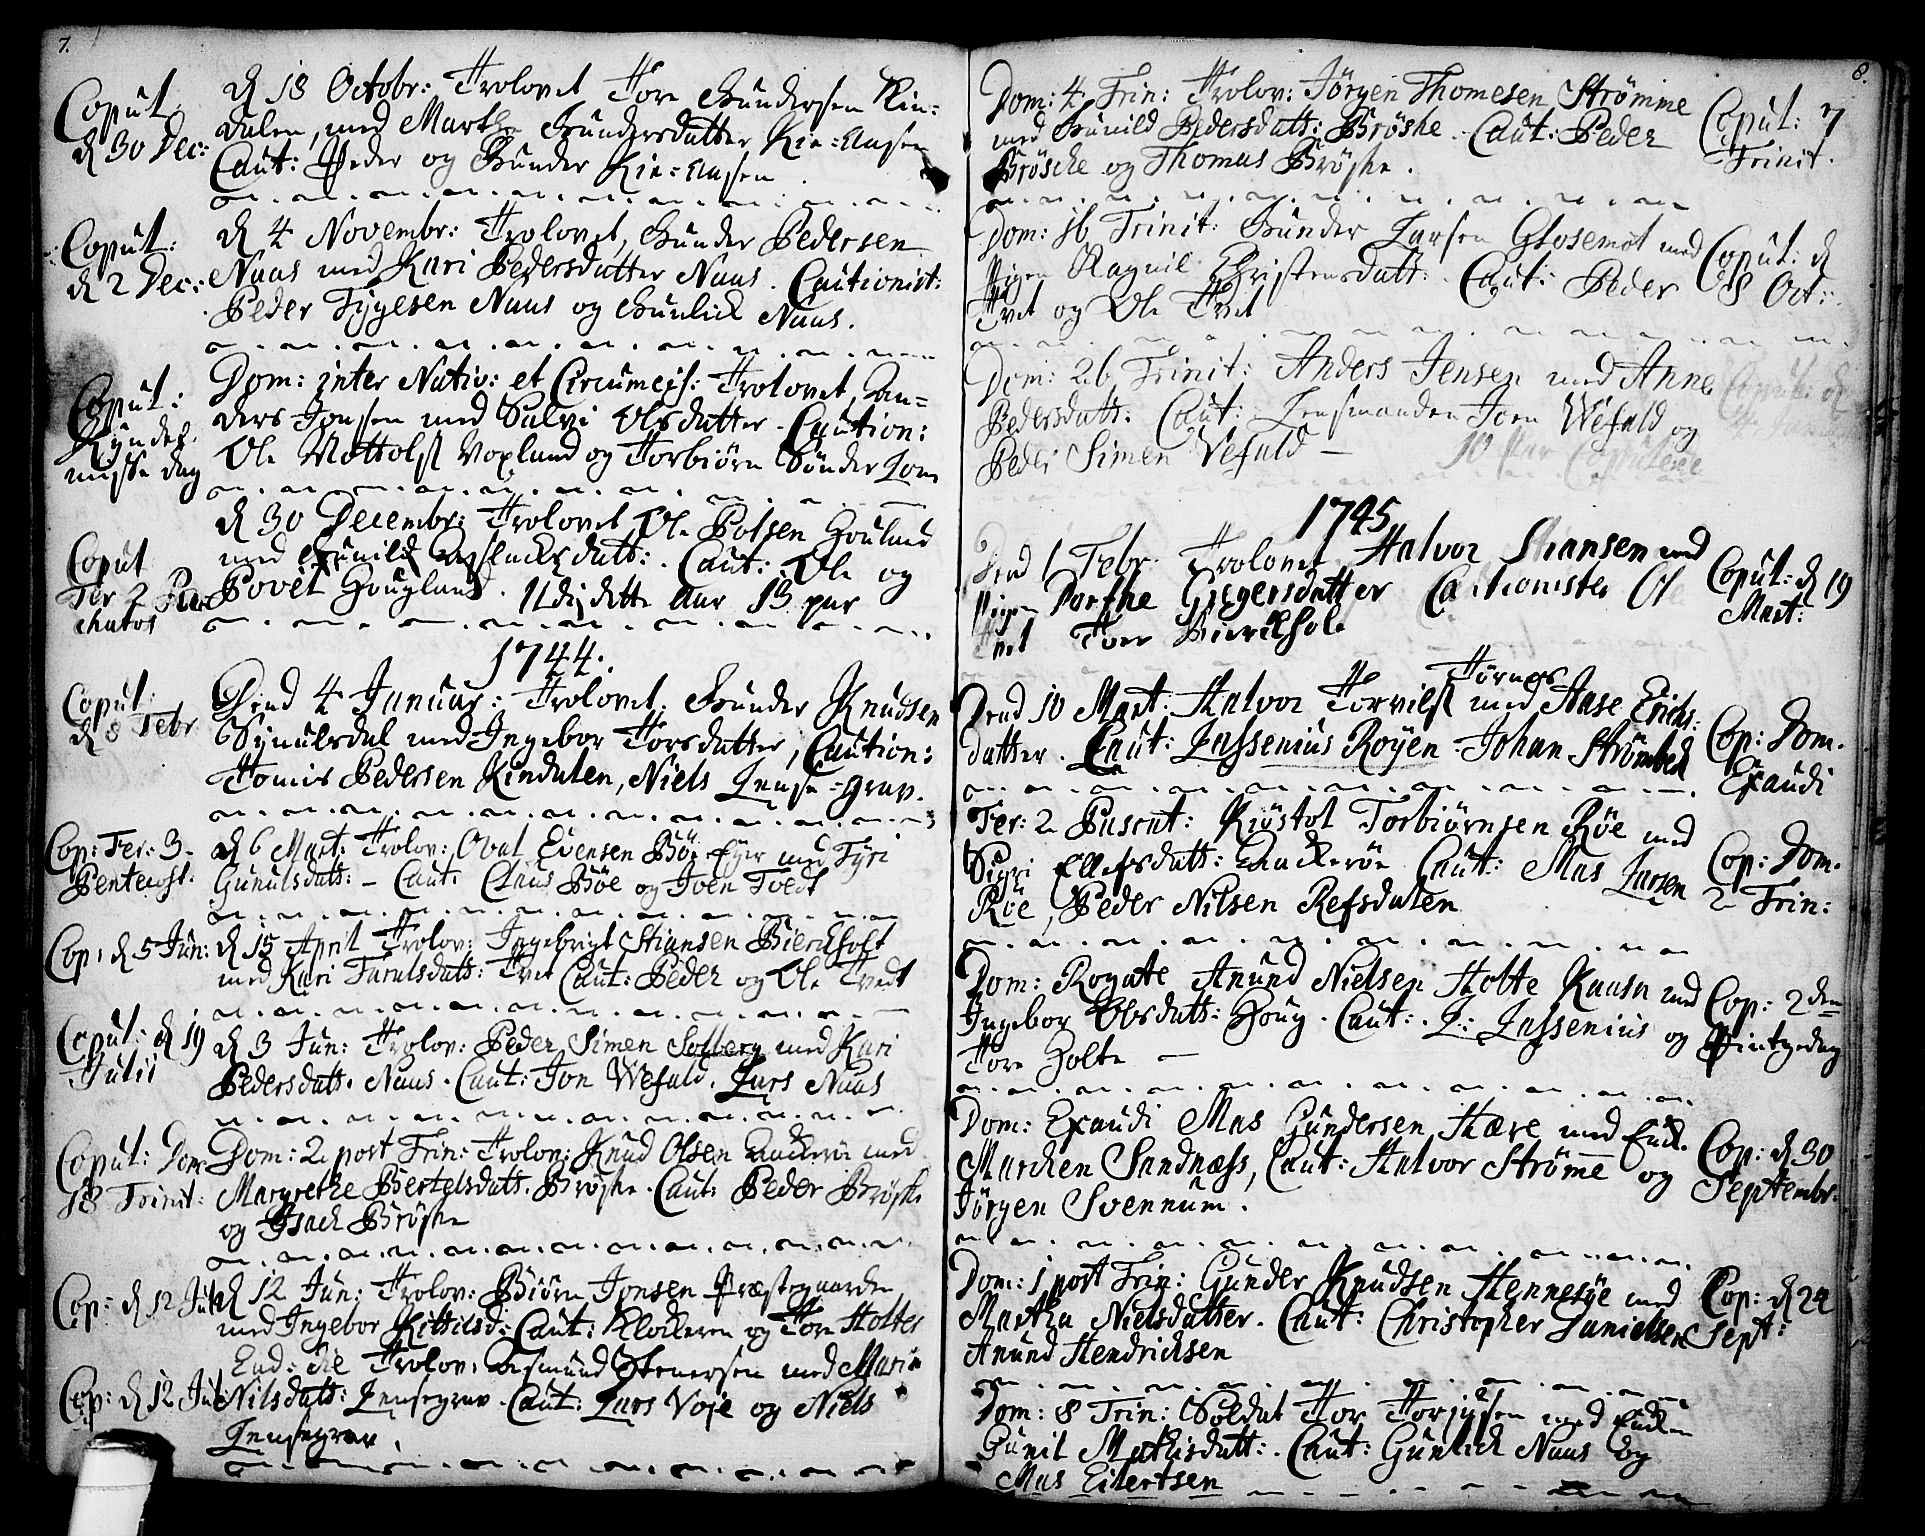 SAKO, Drangedal kirkebøker, F/Fa/L0001: Ministerialbok nr. 1, 1697-1767, s. 7-8